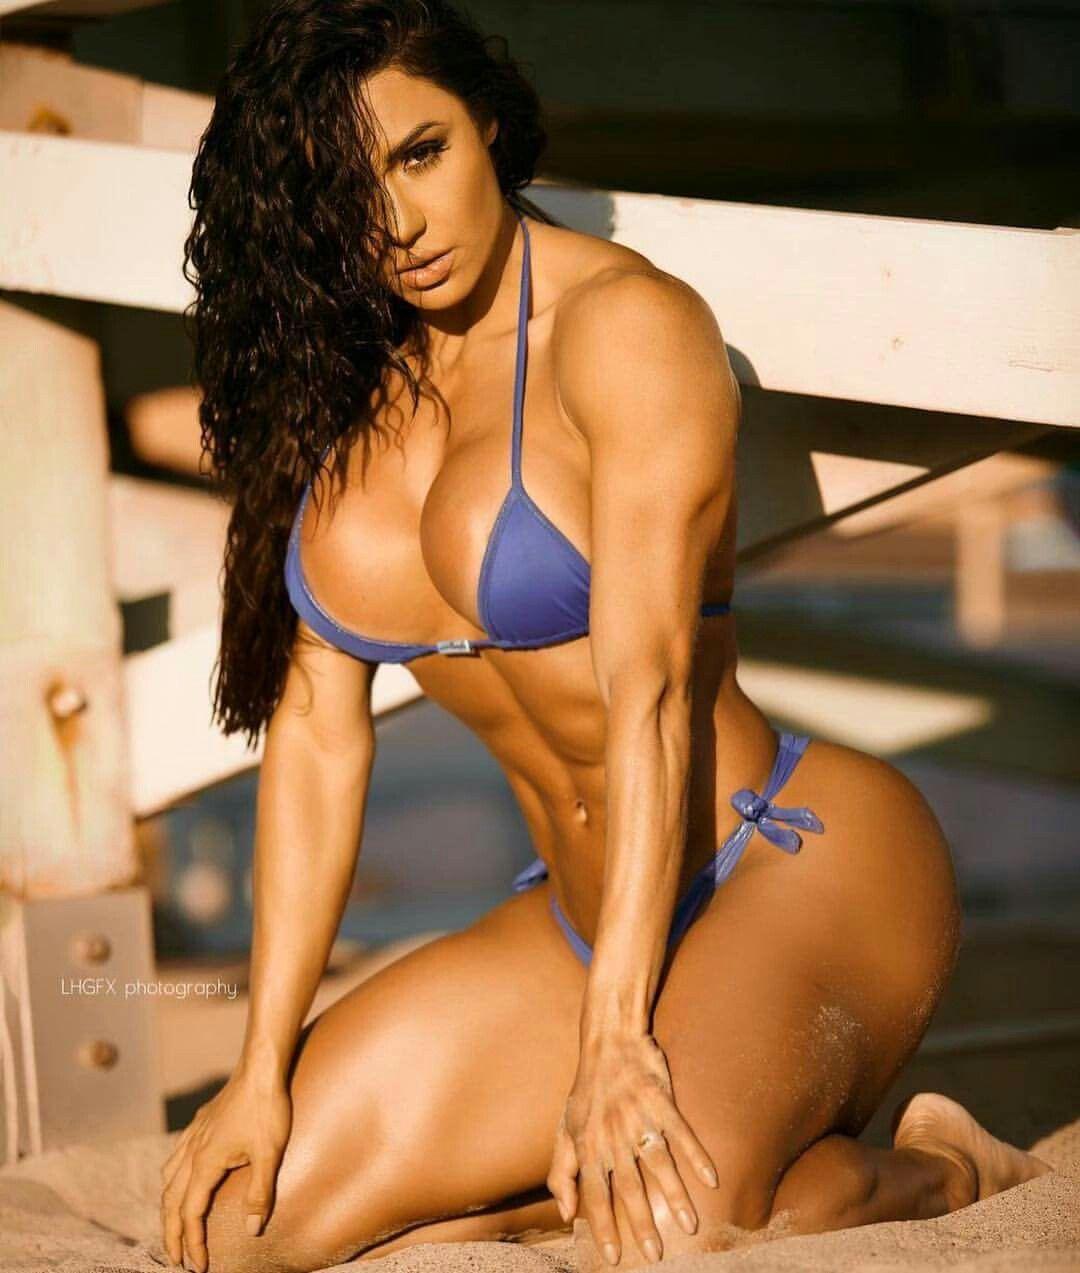 Flex Board Models >> Gracyanne Barbosa   Fit Chicks   Pinterest   Muscles, Motivation and Athletic girls